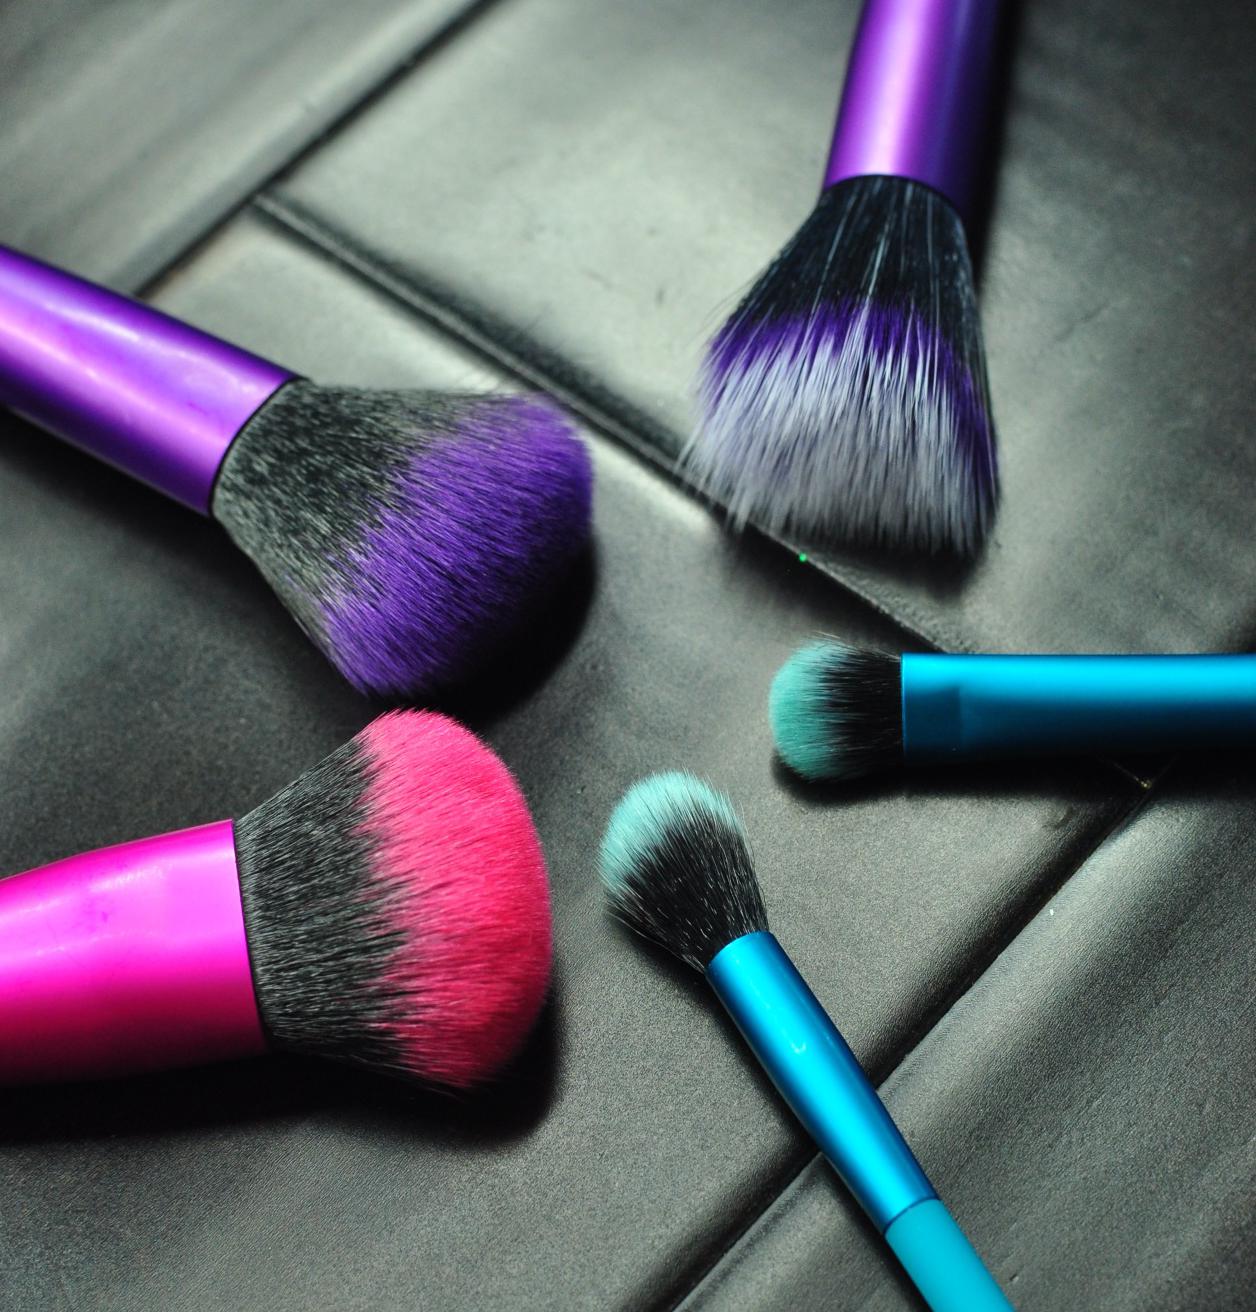 Moda Pro Makeup Brushes By Royal & Langnickel Makeup